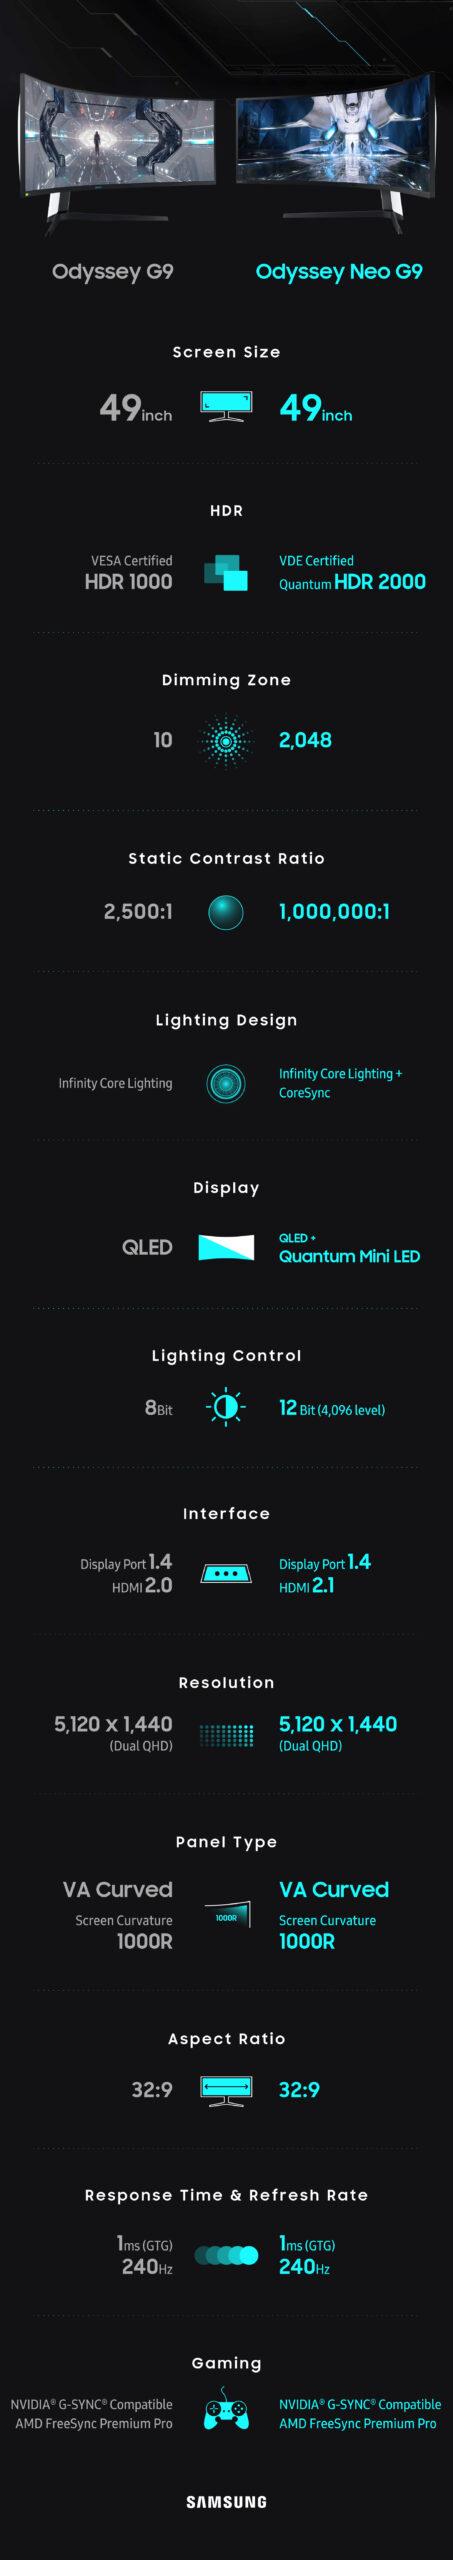 Samsung Odyssey Neo G9 Infographic